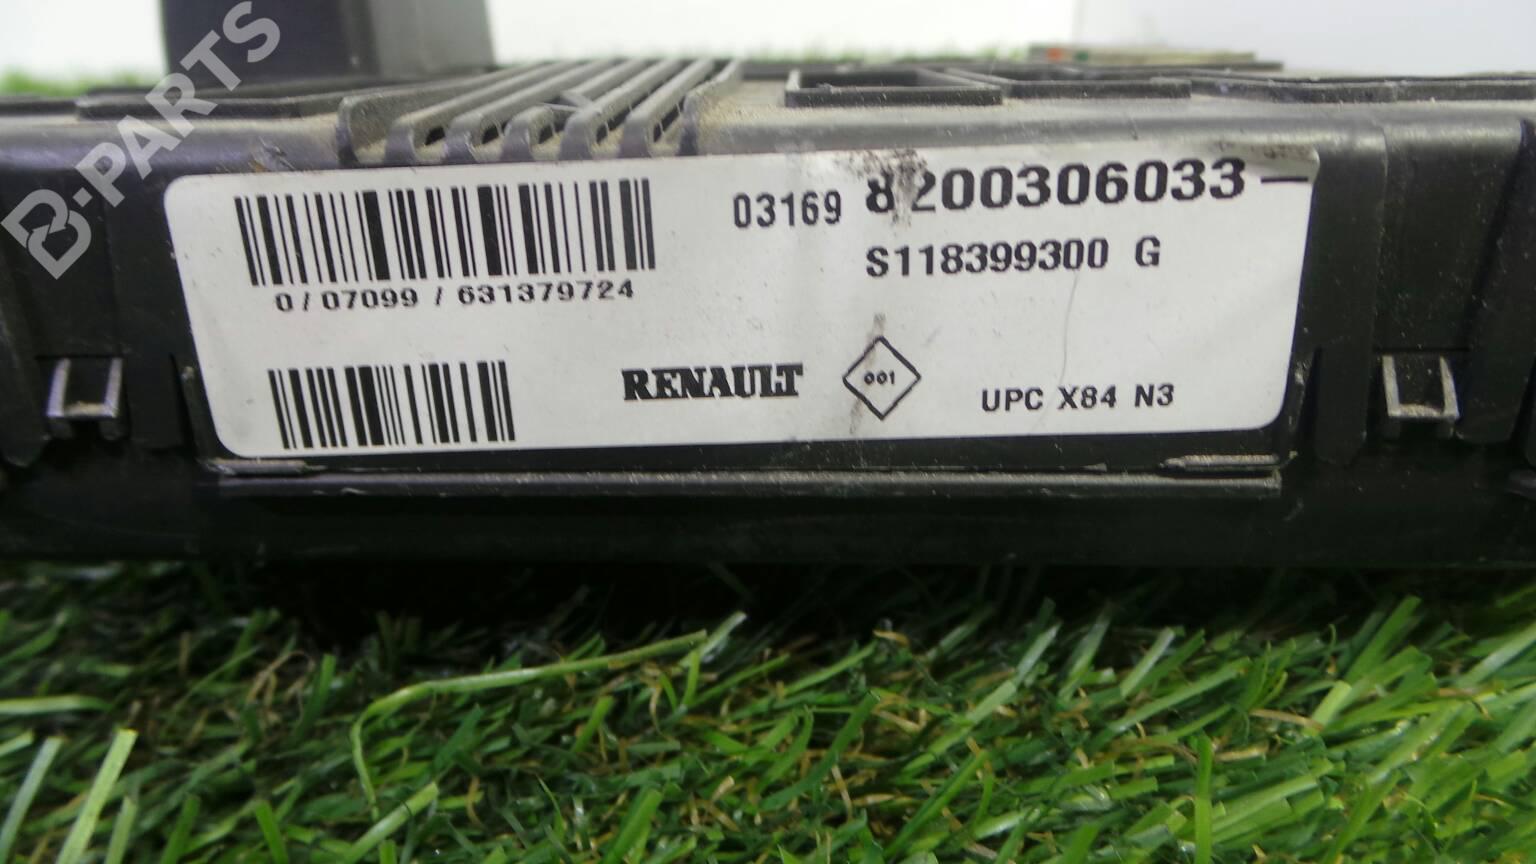 hight resolution of fuse box 8200 306 033 renault megane ii bm0 1 cm0